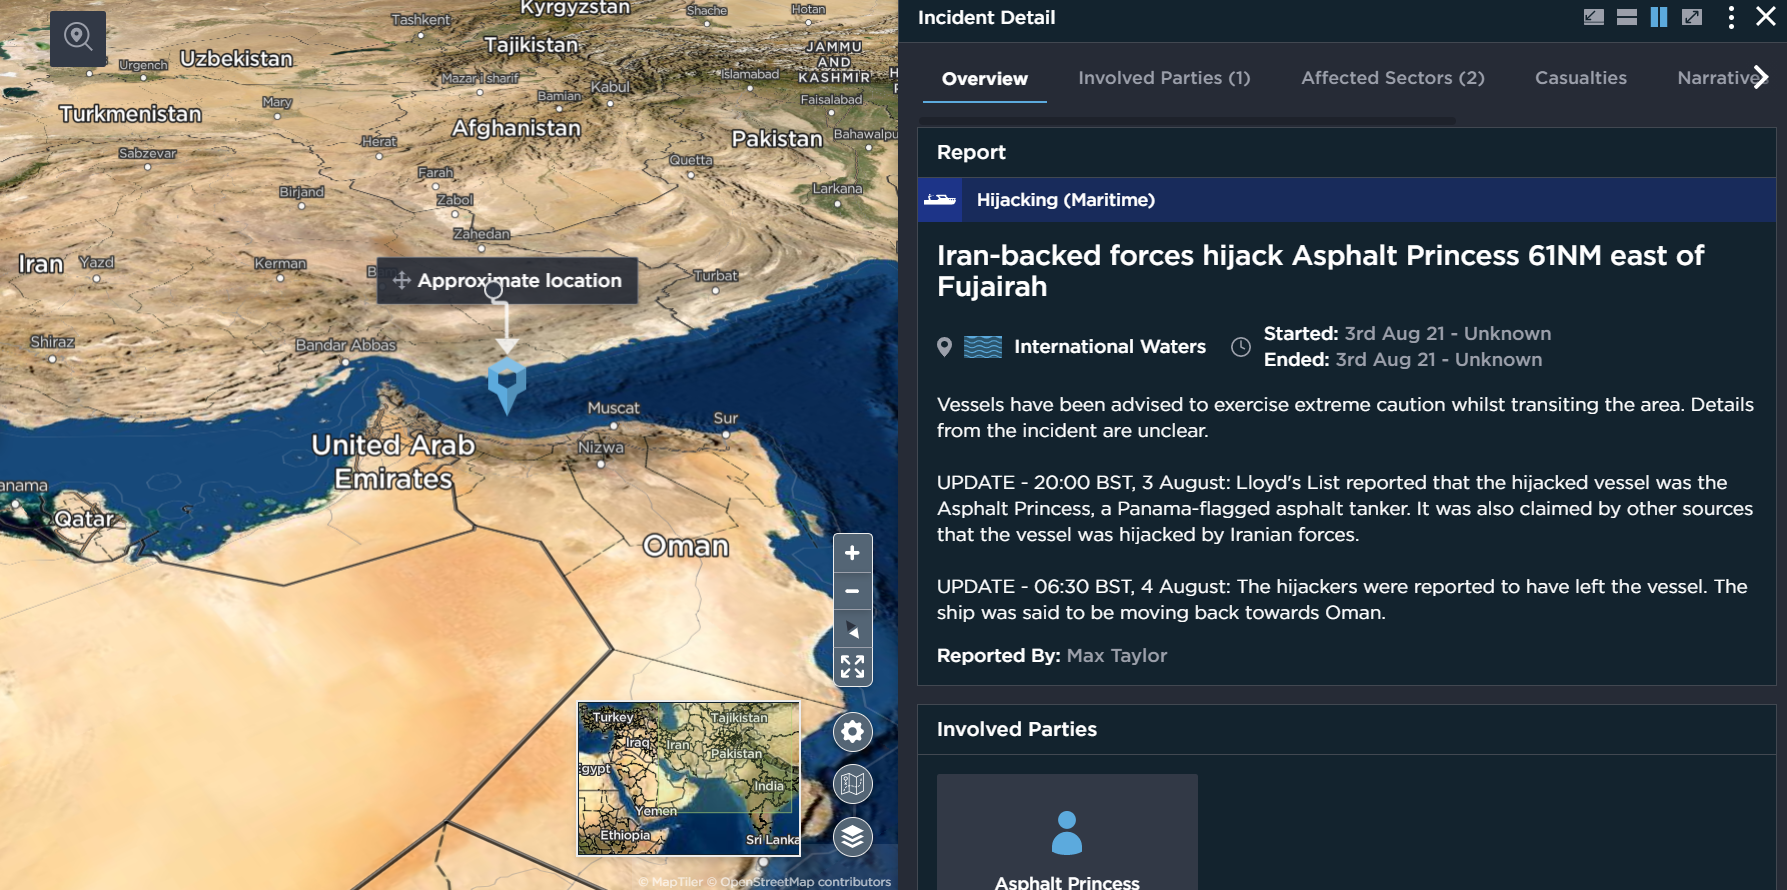 Asphalt Princess hijacking iran accused attack on shipping